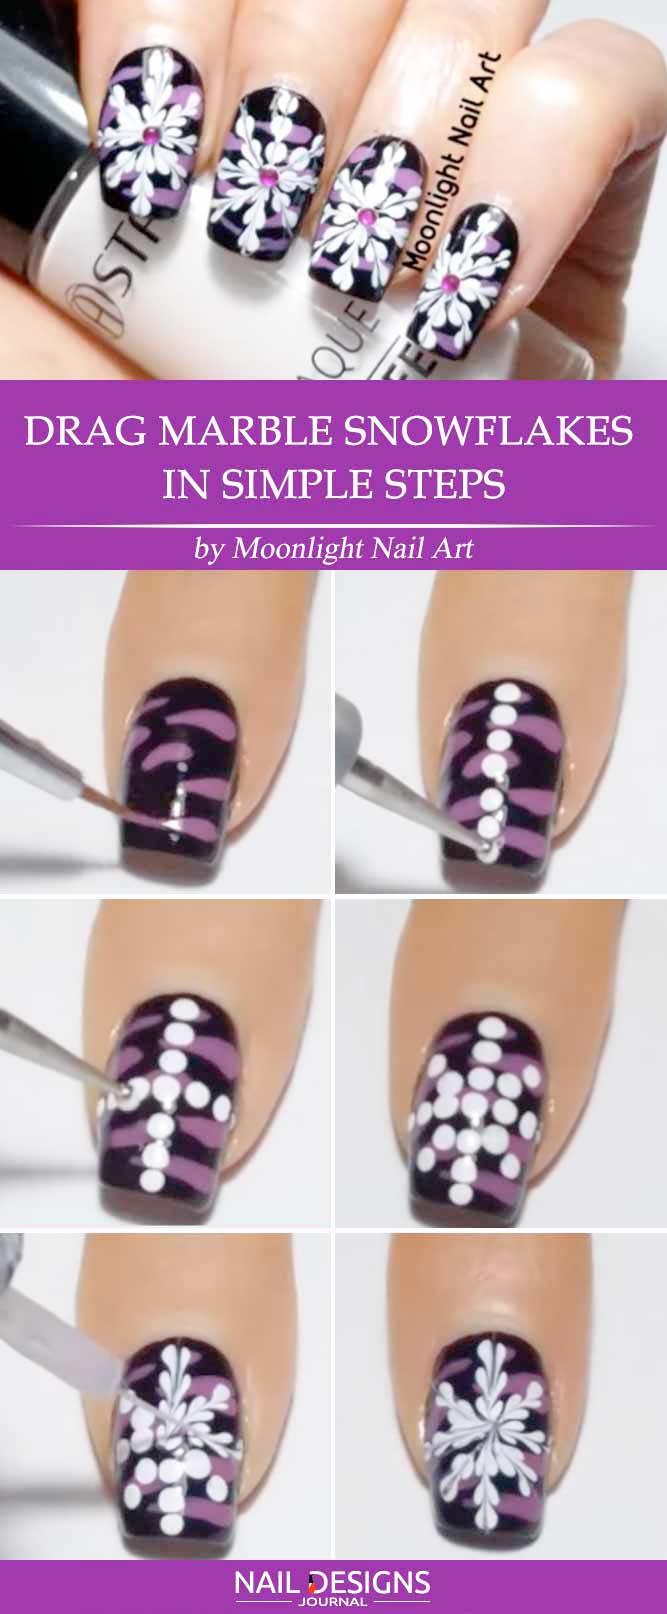 7 Tutorials On Snowflake Nails Designs Crazyforus